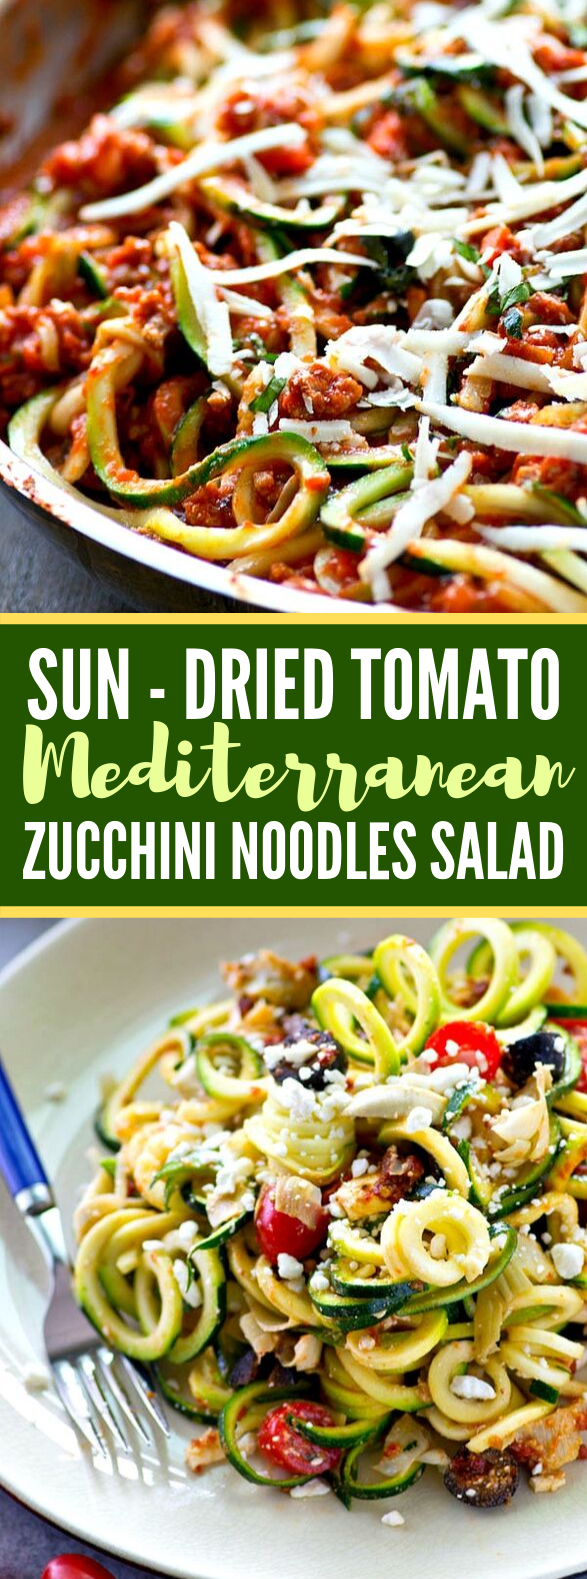 SUN-DRIED TOMATO MEDITERRANEAN ZUCCHINI NOODLES SALAD #vegetarian #dressing